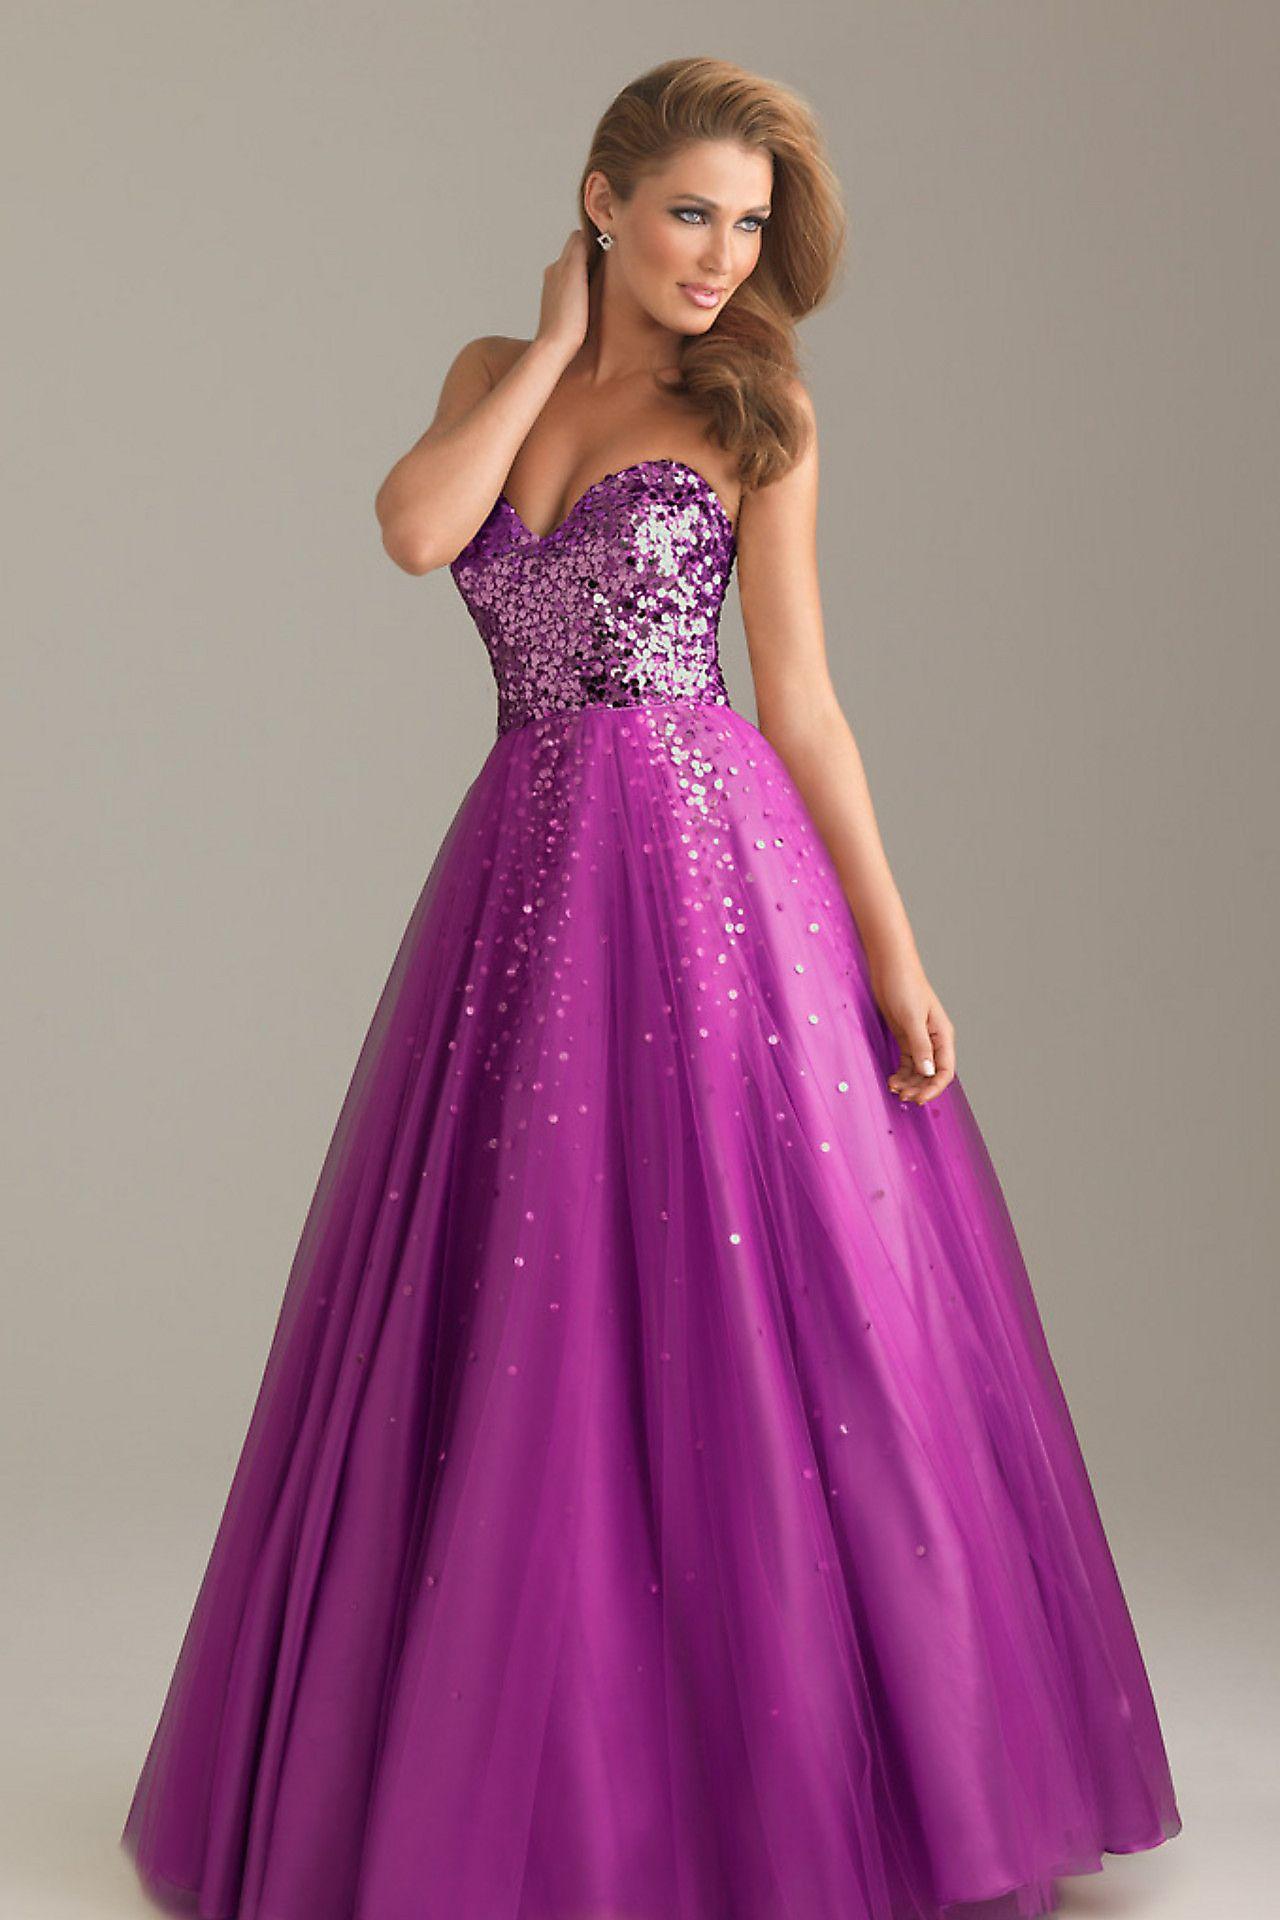 Best affordable wedding dress shops london  Cheap Vogue Prom Dresses Ball Gown Sweetheart Floor length Chiffon